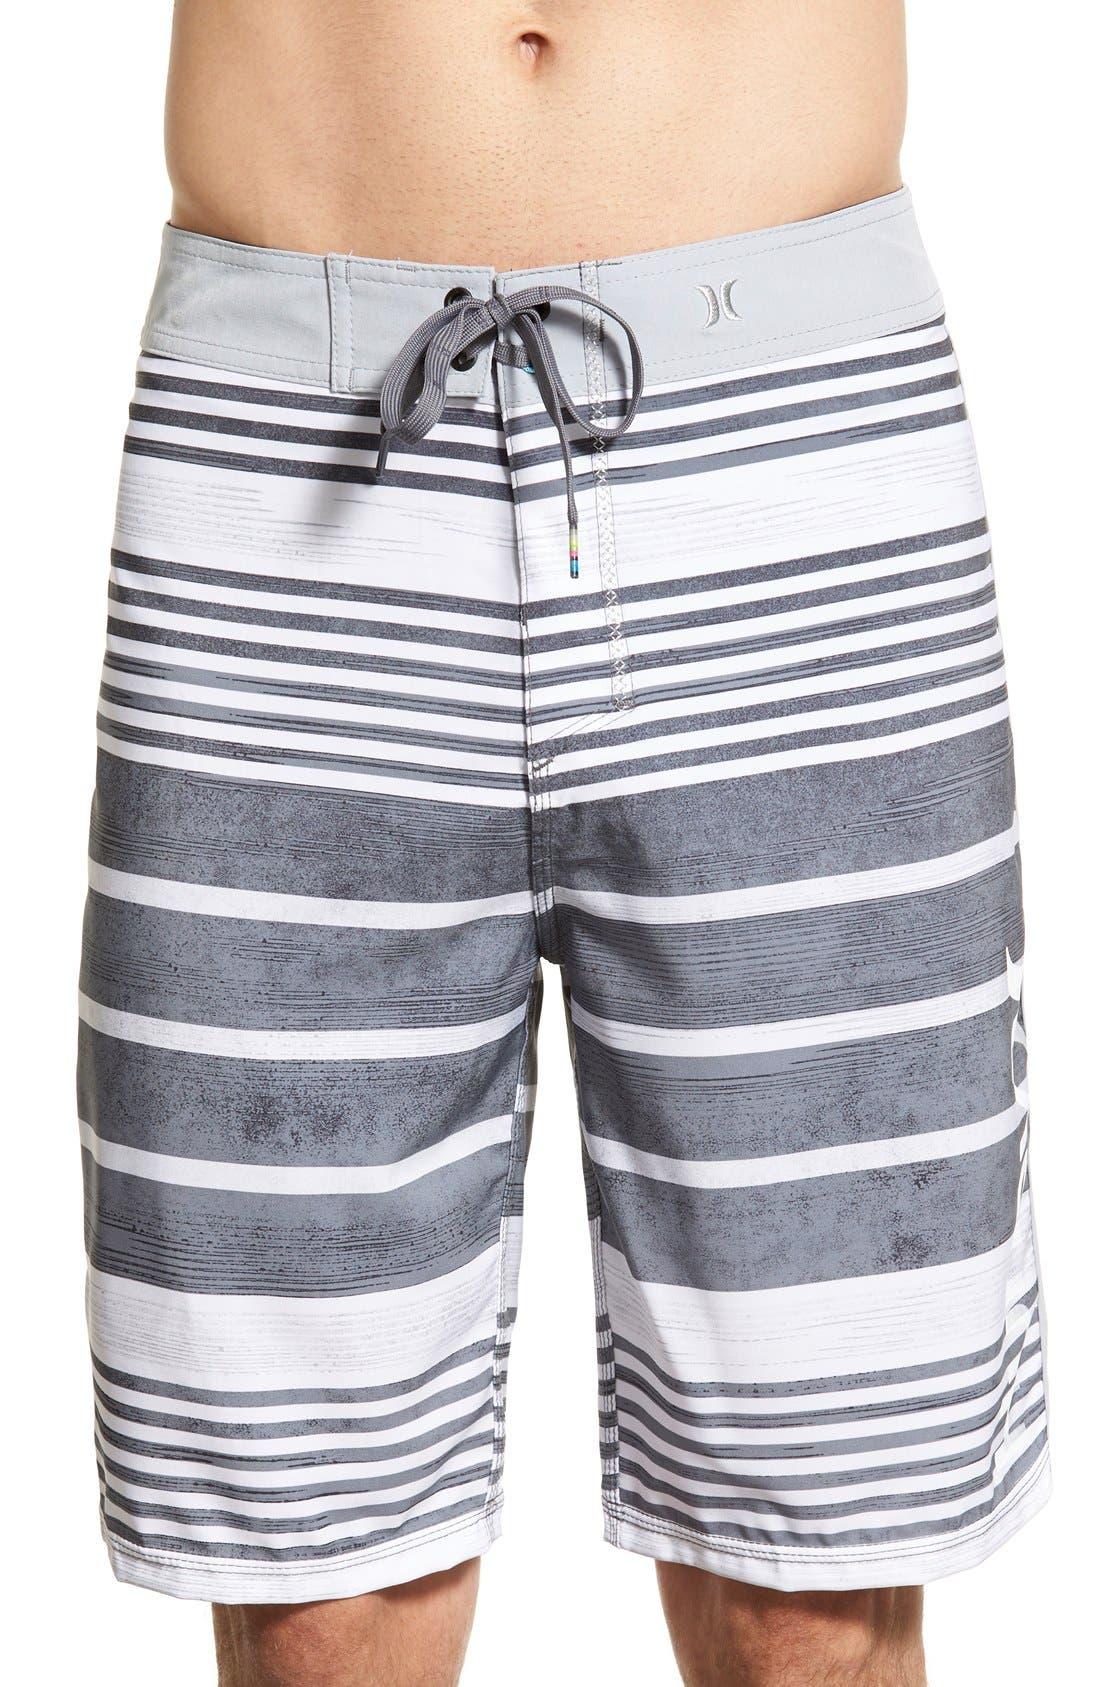 'Phantom Hightide' Water-Repellent Board Shorts,                             Main thumbnail 1, color,                             060